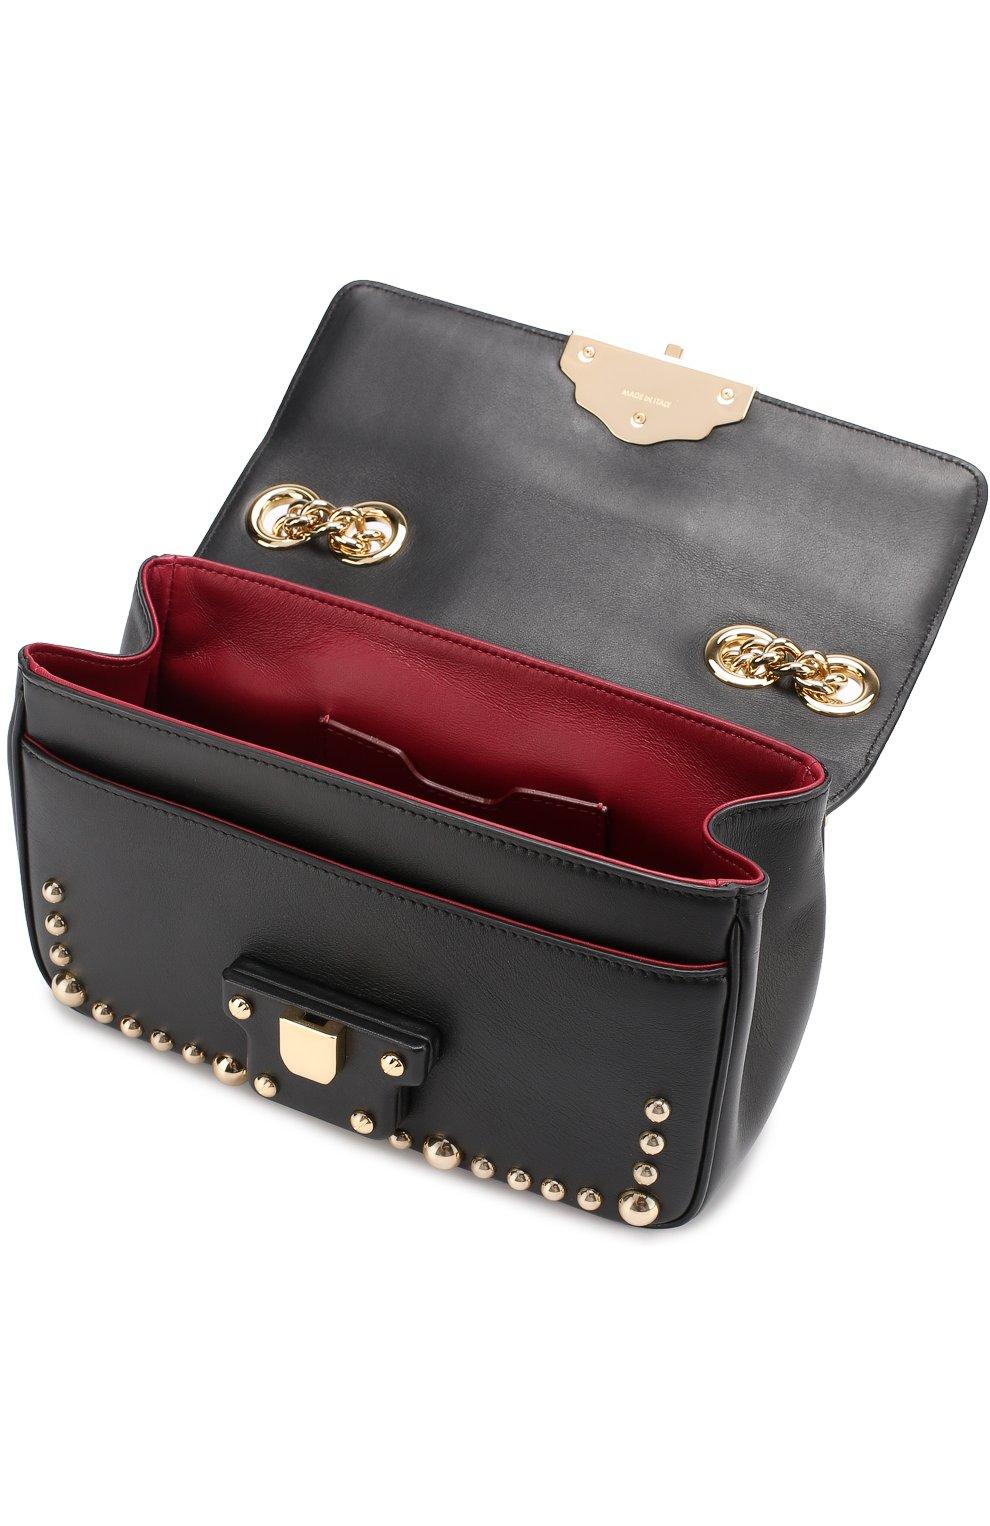 Сумка Lucia с заклепками Dolce & Gabbana черная цвета | Фото №4